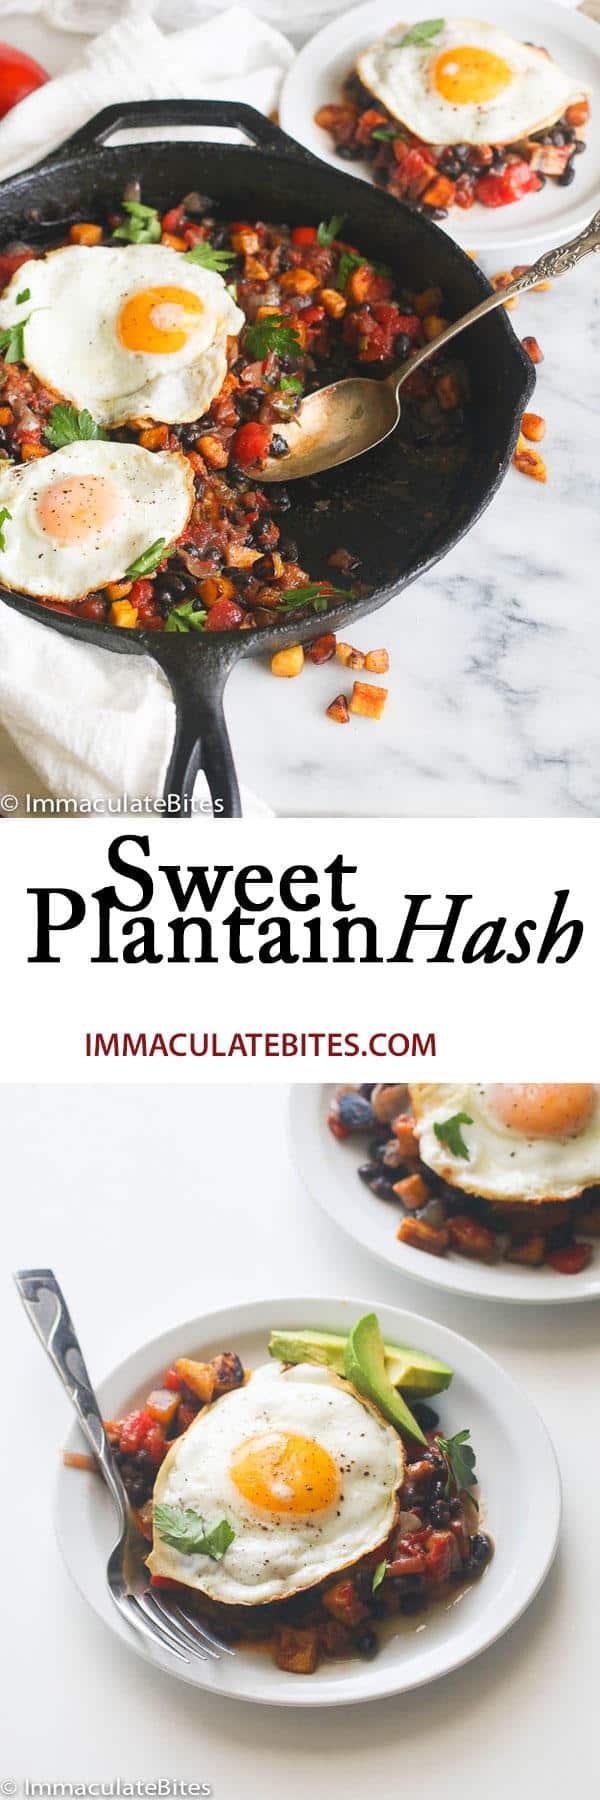 Sweet Plantain Hash